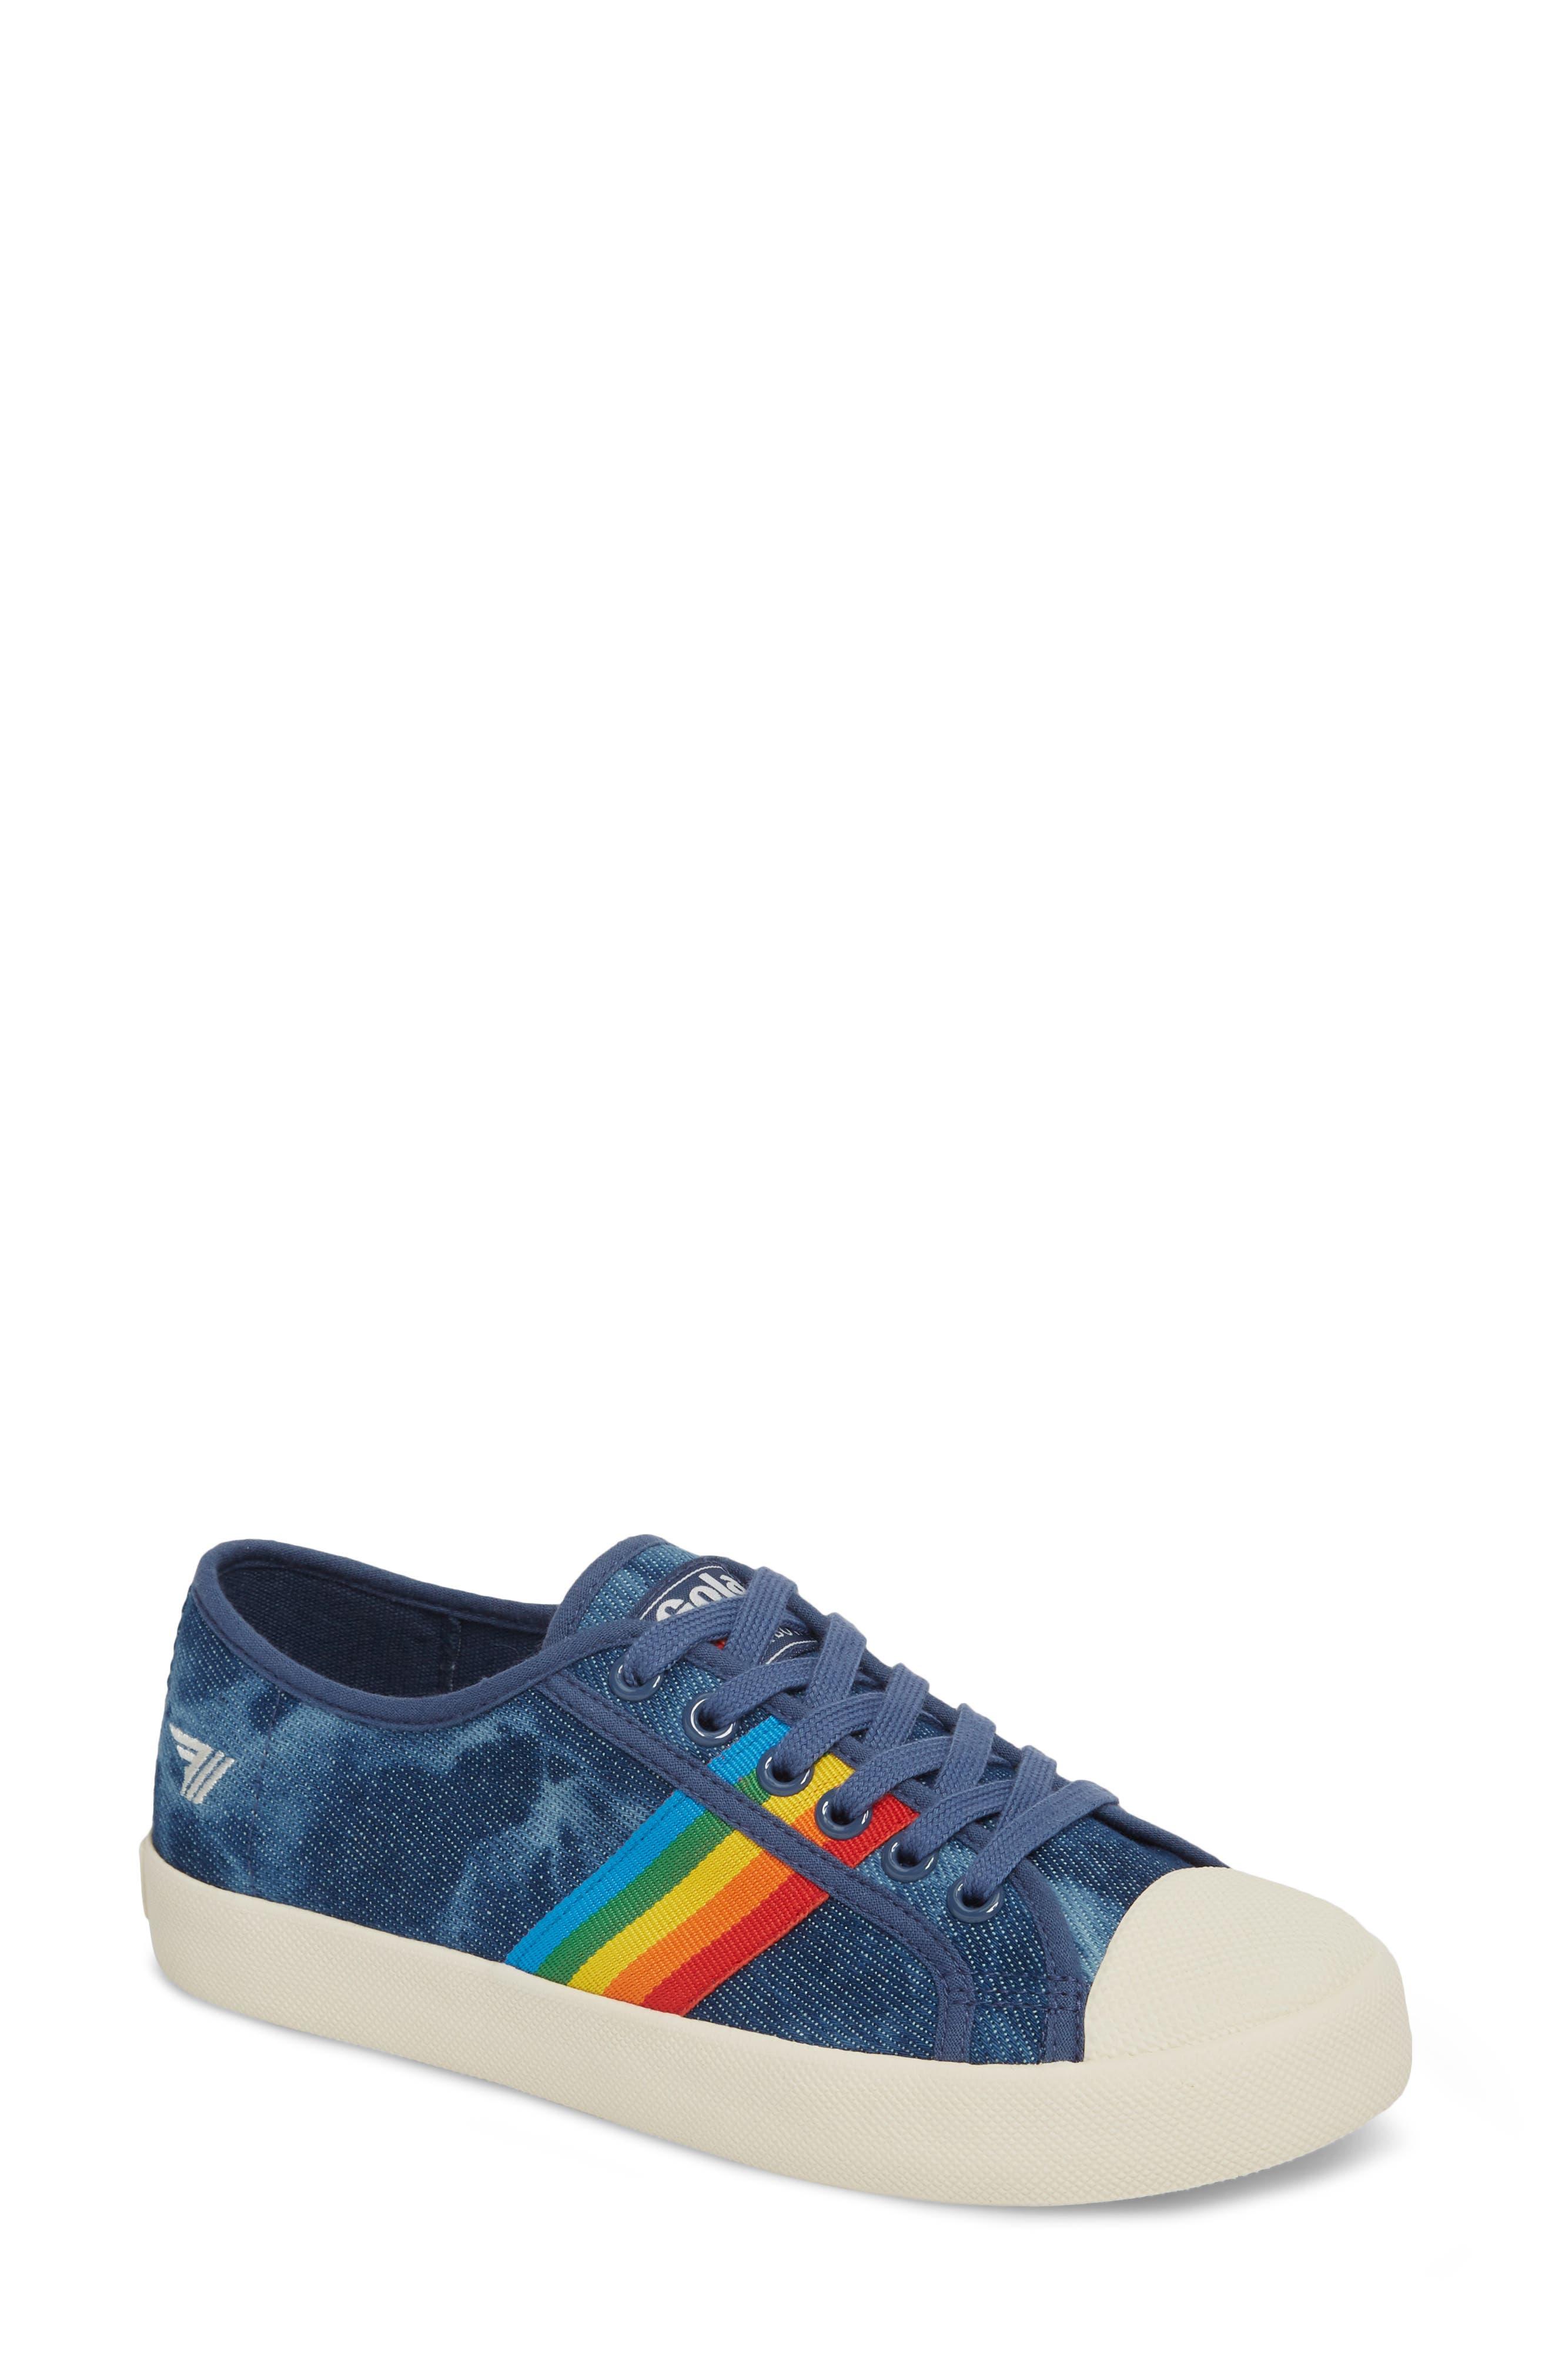 Gola Coaster Rainbow Striped Sneaker (Women)